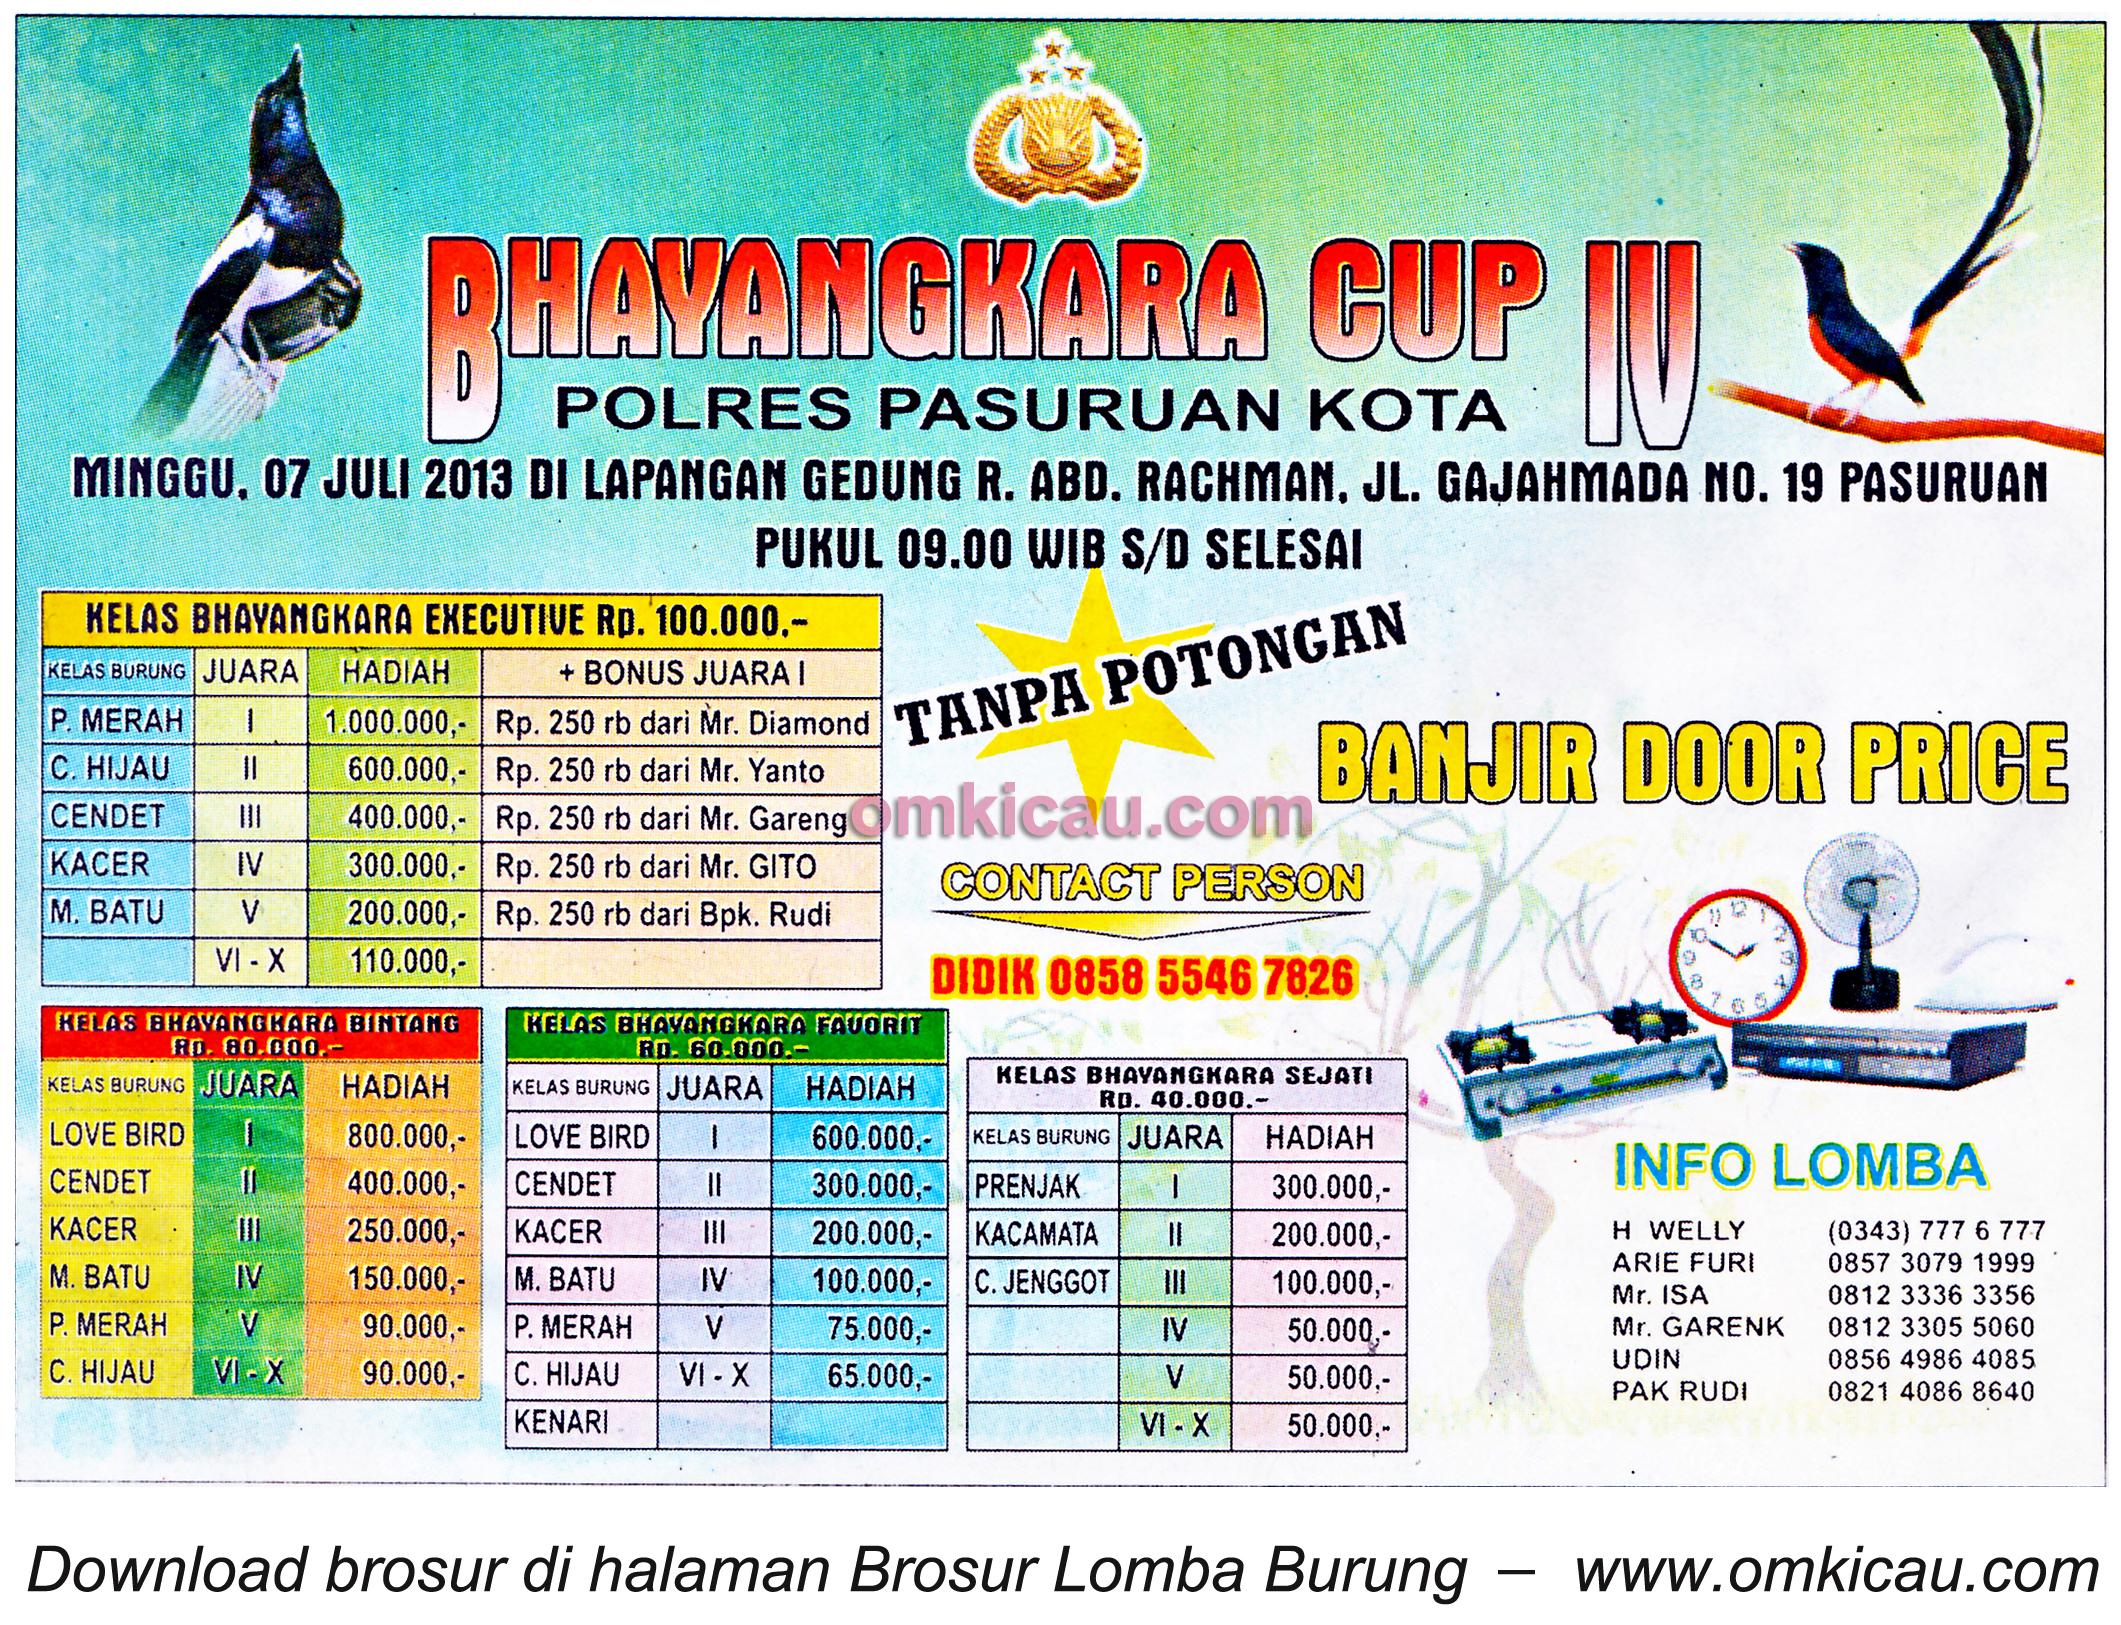 Brosur Lomba Bhayangkara Cup IV Pasuruan 7 Juli 2013